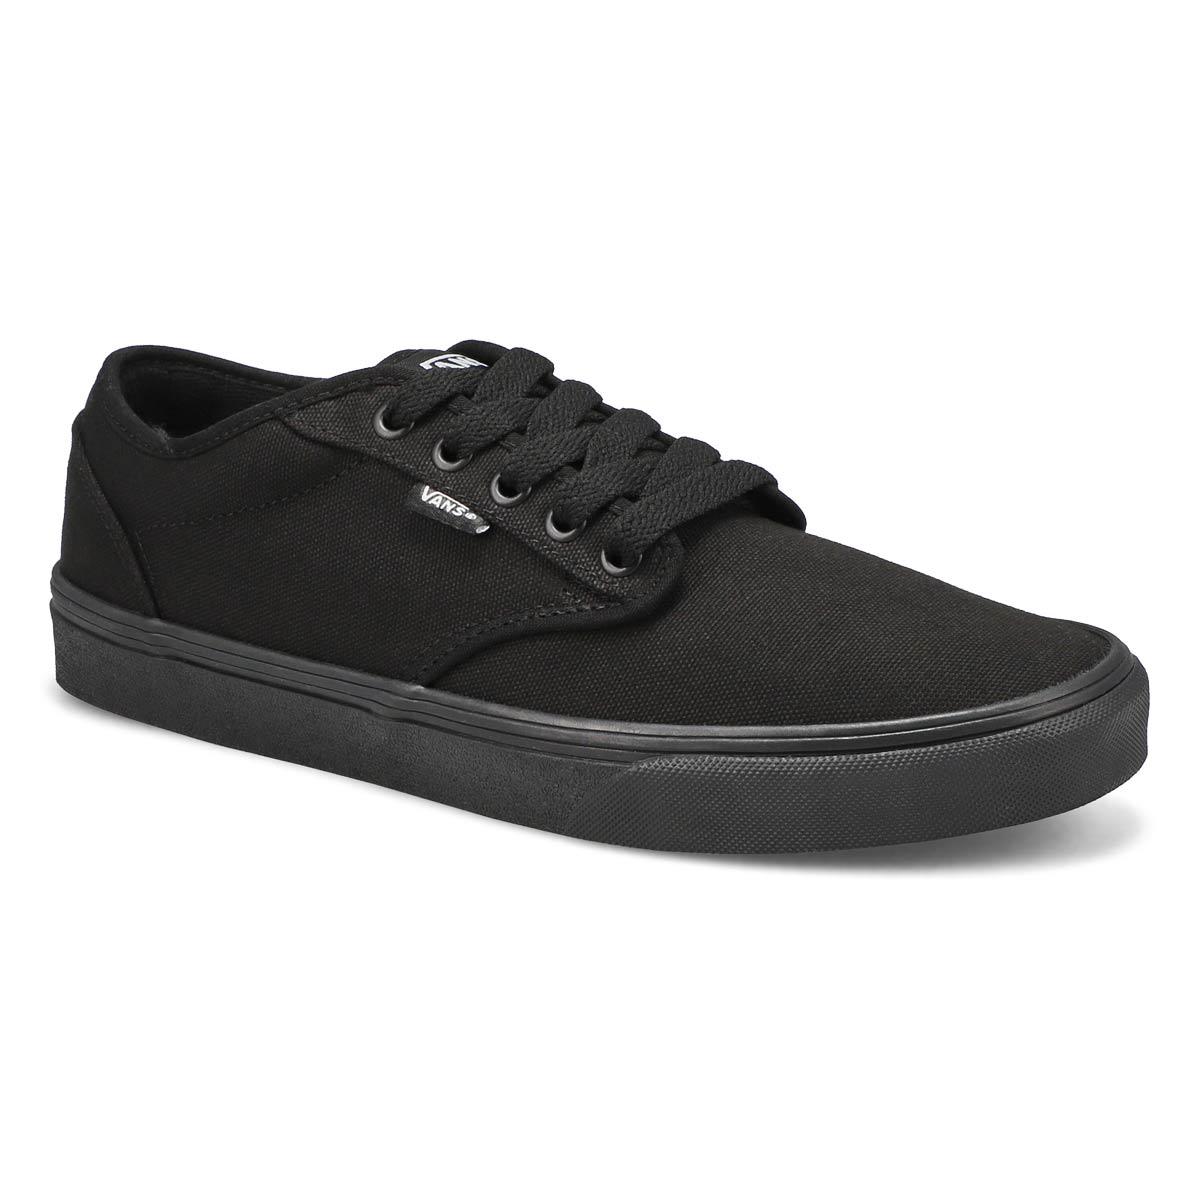 Men's Atwood Sneaker - Black